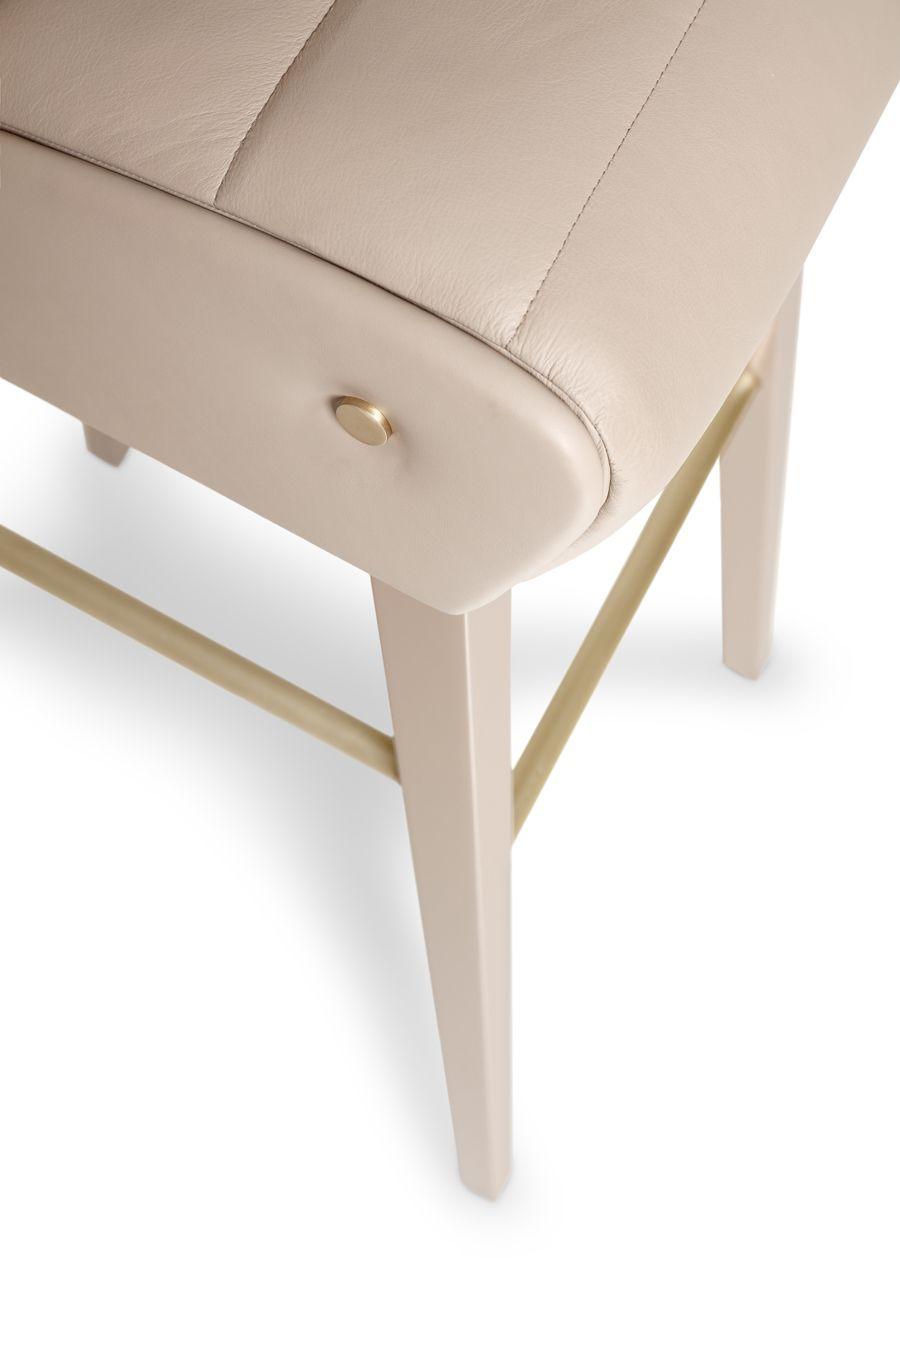 Munna (RU) Барный стул Newman от португальского бренда Munna